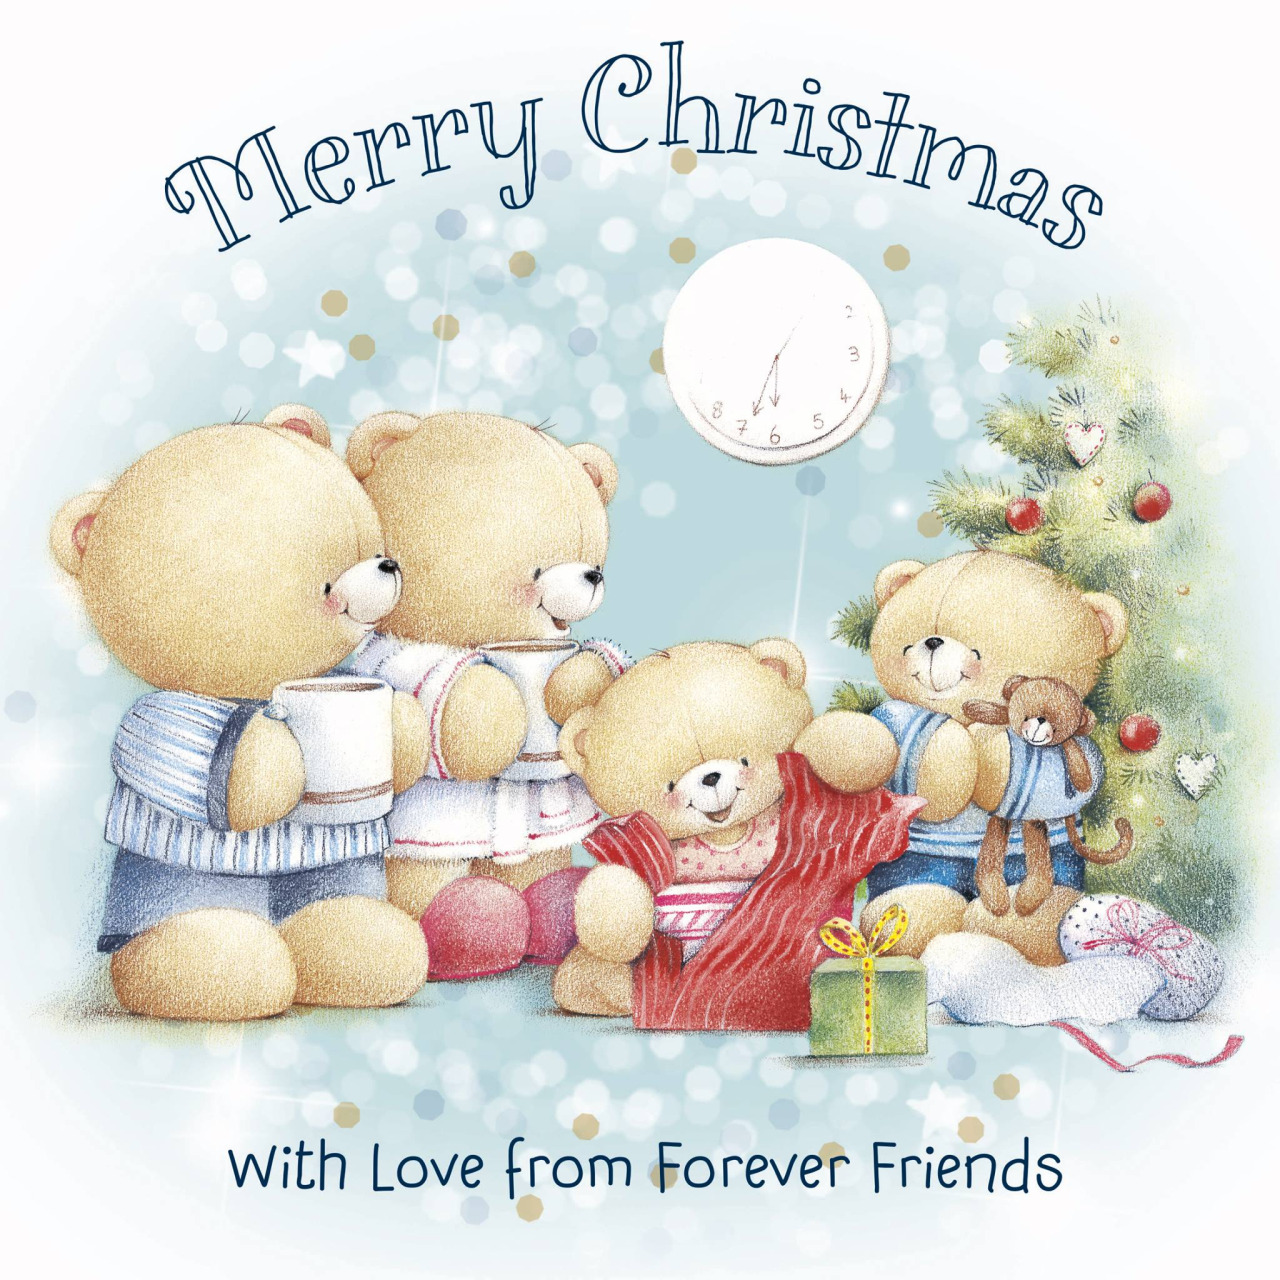 Cute Merry Christmas Wallpaper Dogs Cool Wallpaper 可愛圖案 Forever Friends Wallpapers 卡通桌布 熊